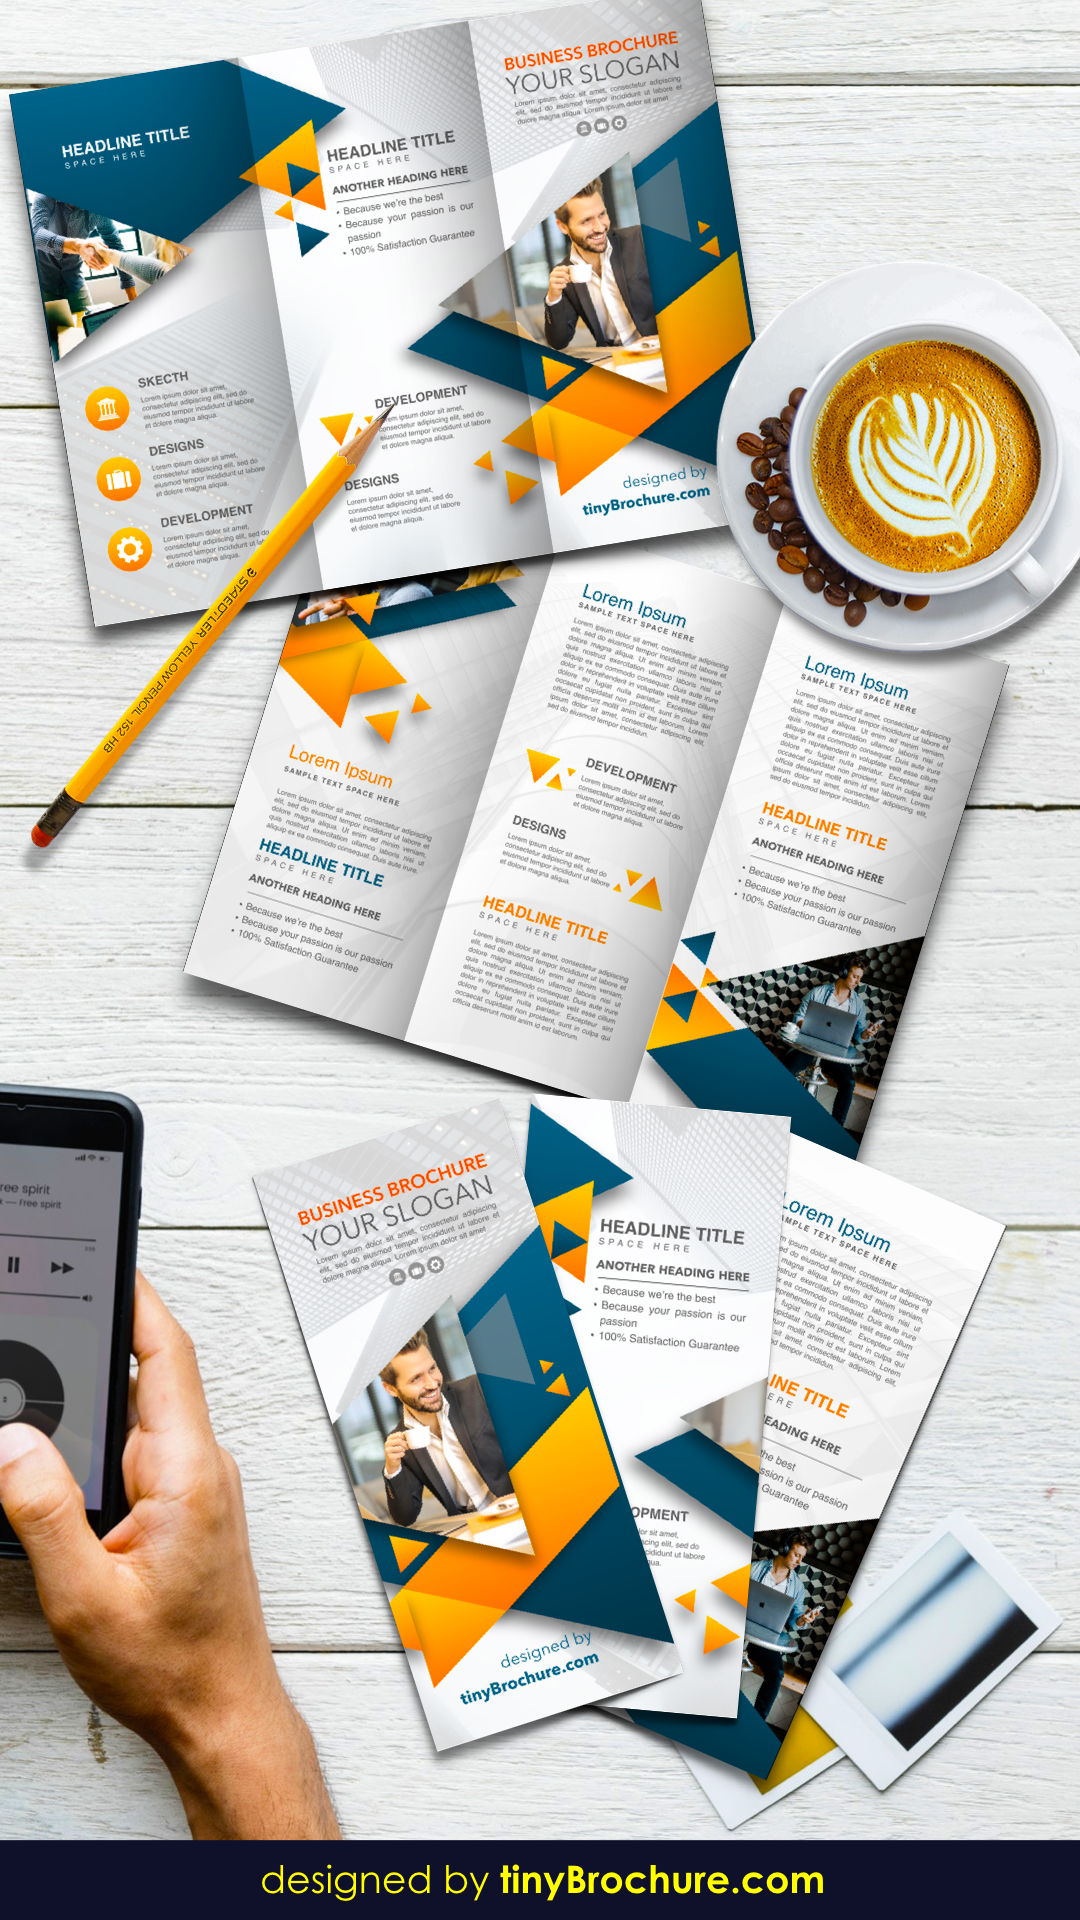 Pin By Minuteman Press Redmond On Tri Fold Brochures Brochure Design Template Trifold Brochure Template Brochure Design